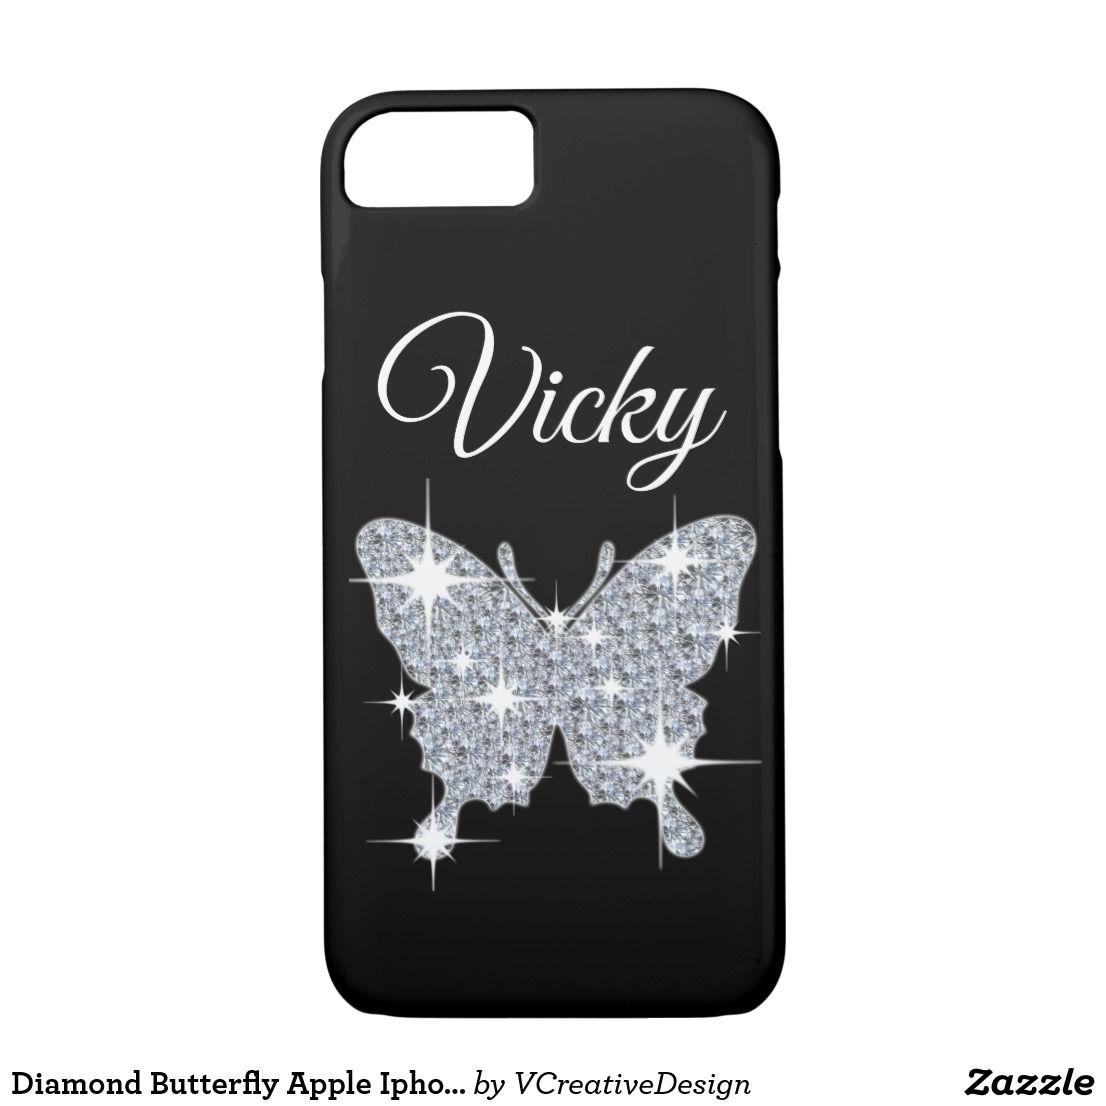 Diamond butterfly apple iphone 78 case iphone case